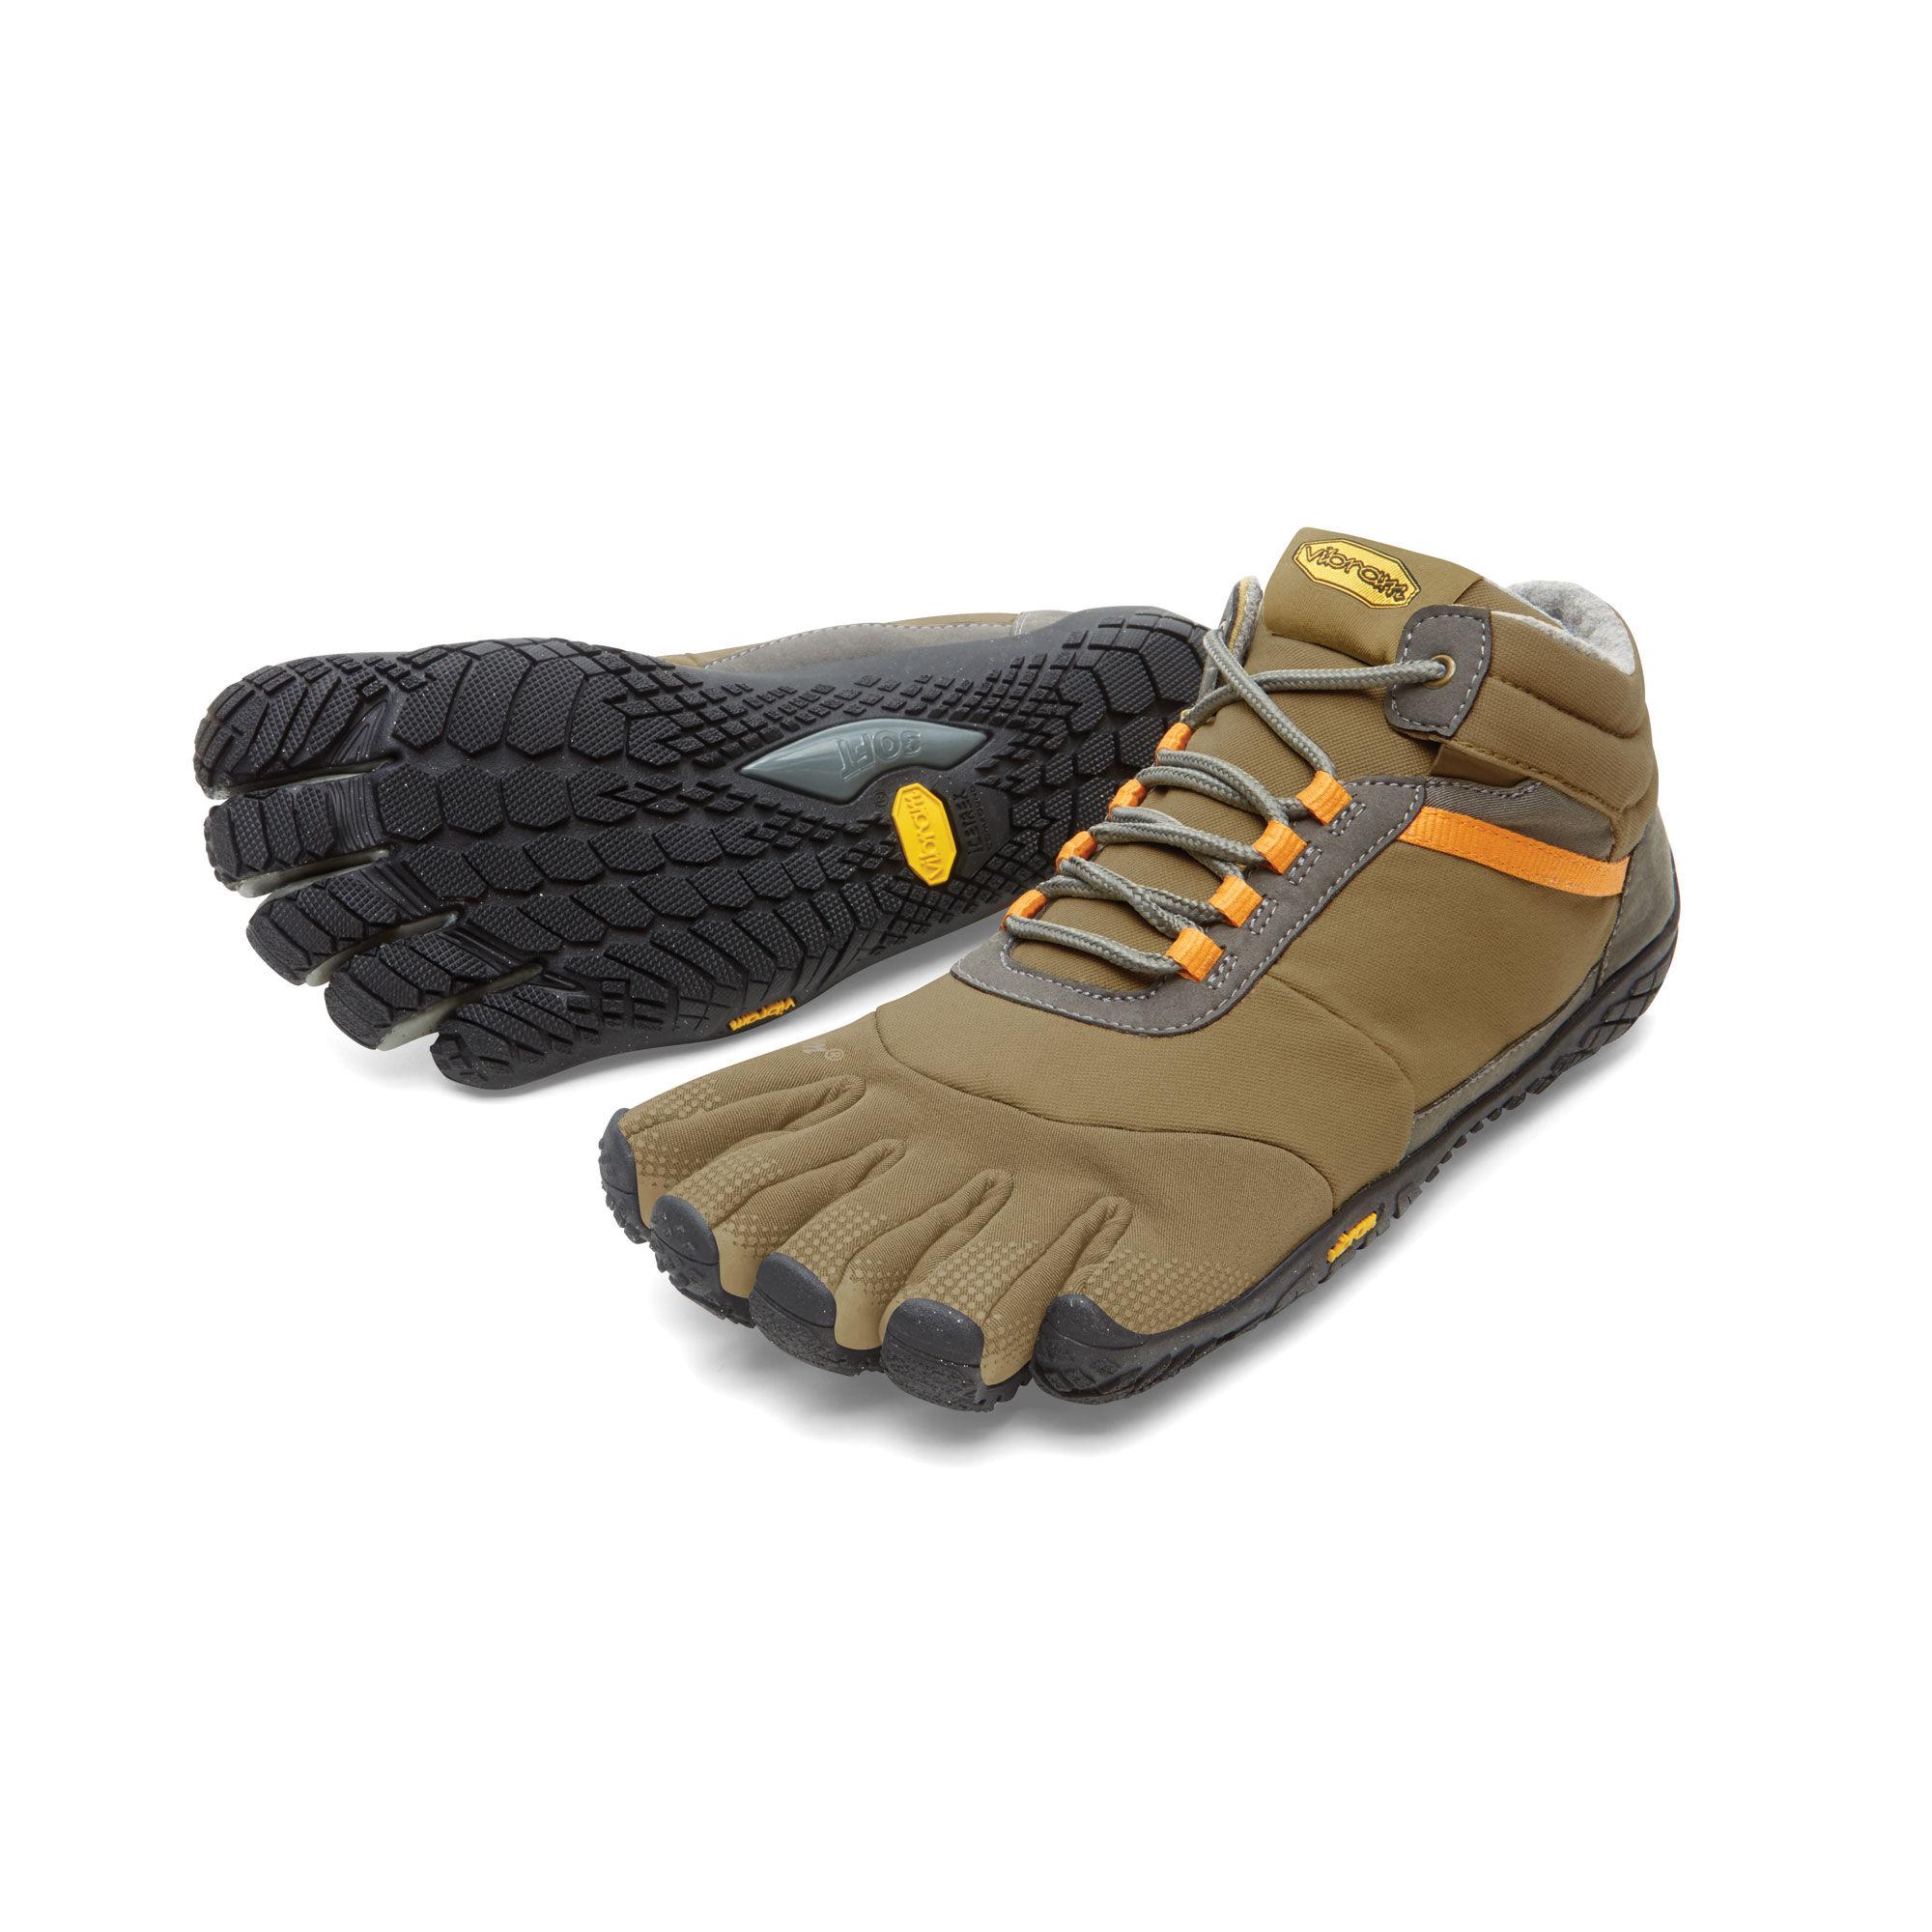 Trek Ascent Insulated, Shoes Homme - Khaki/Orange, 45 EUVibram Fivefingers